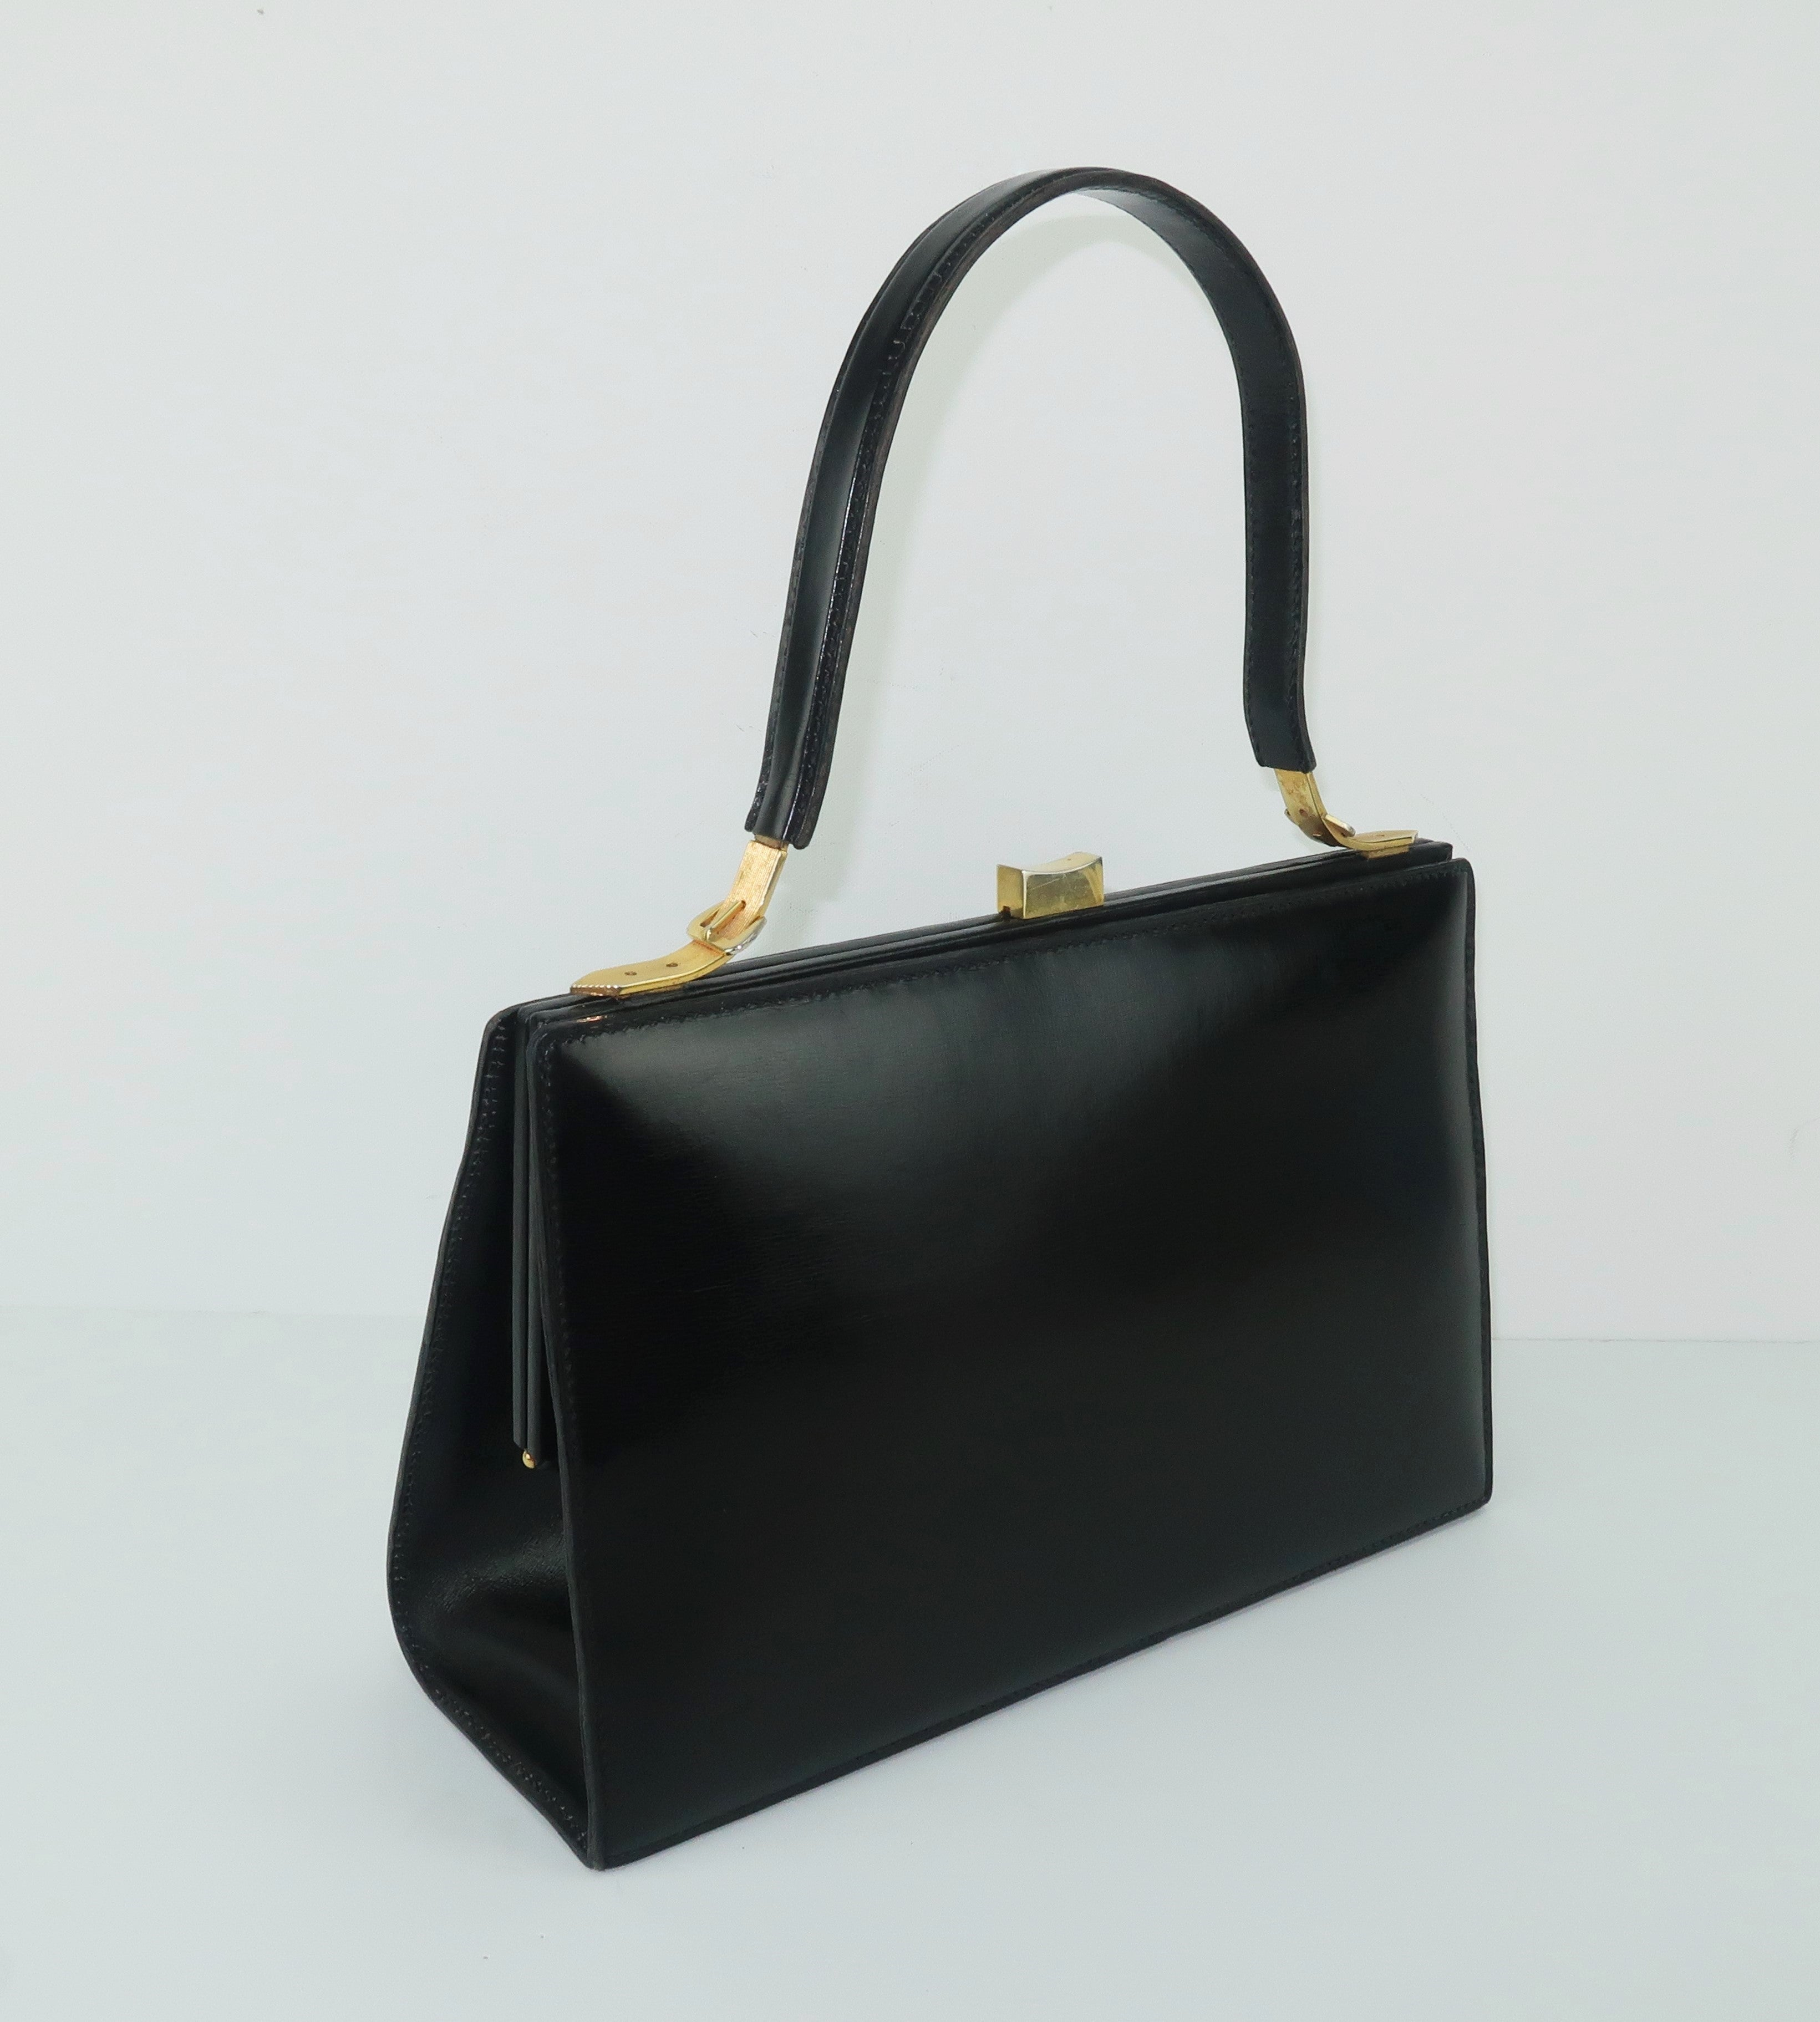 706763842e1 Lancel Black Leather Handbag With Buckle Handle, 1950s For Sale at 1stdibs